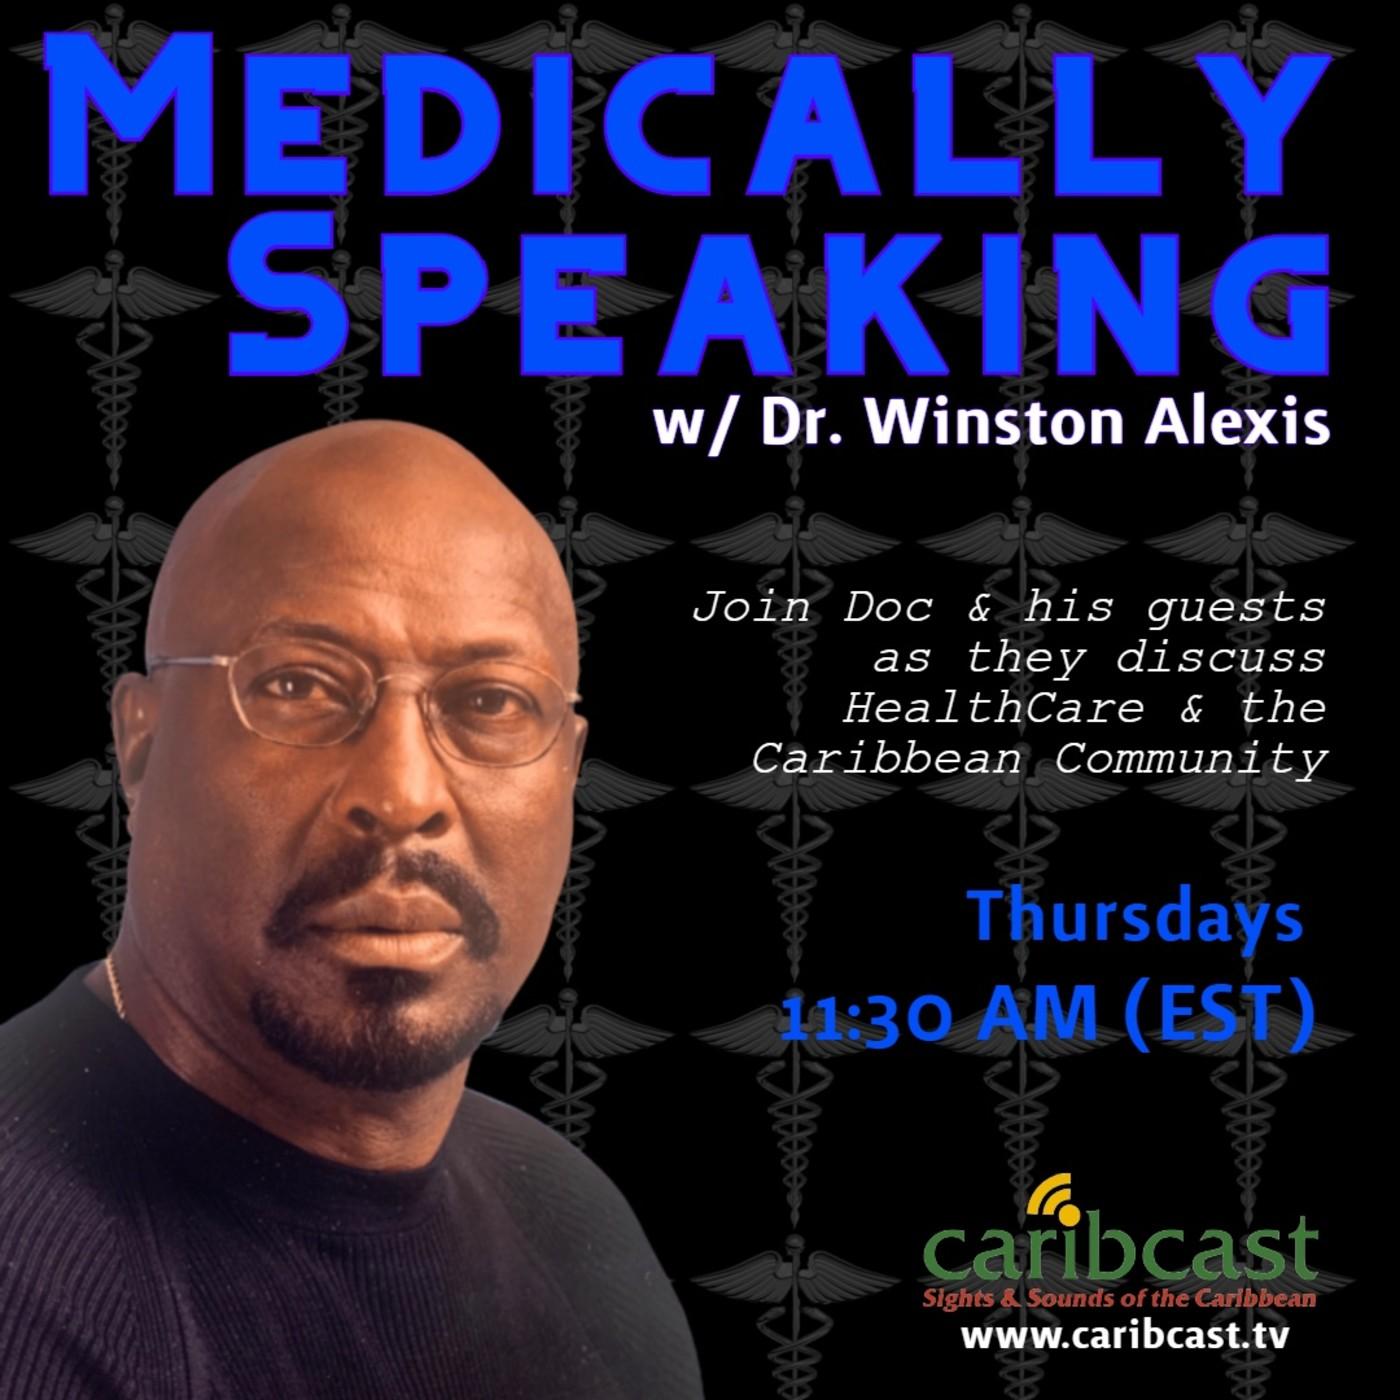 Medically Speaking w/ Dr. Winston Alexis